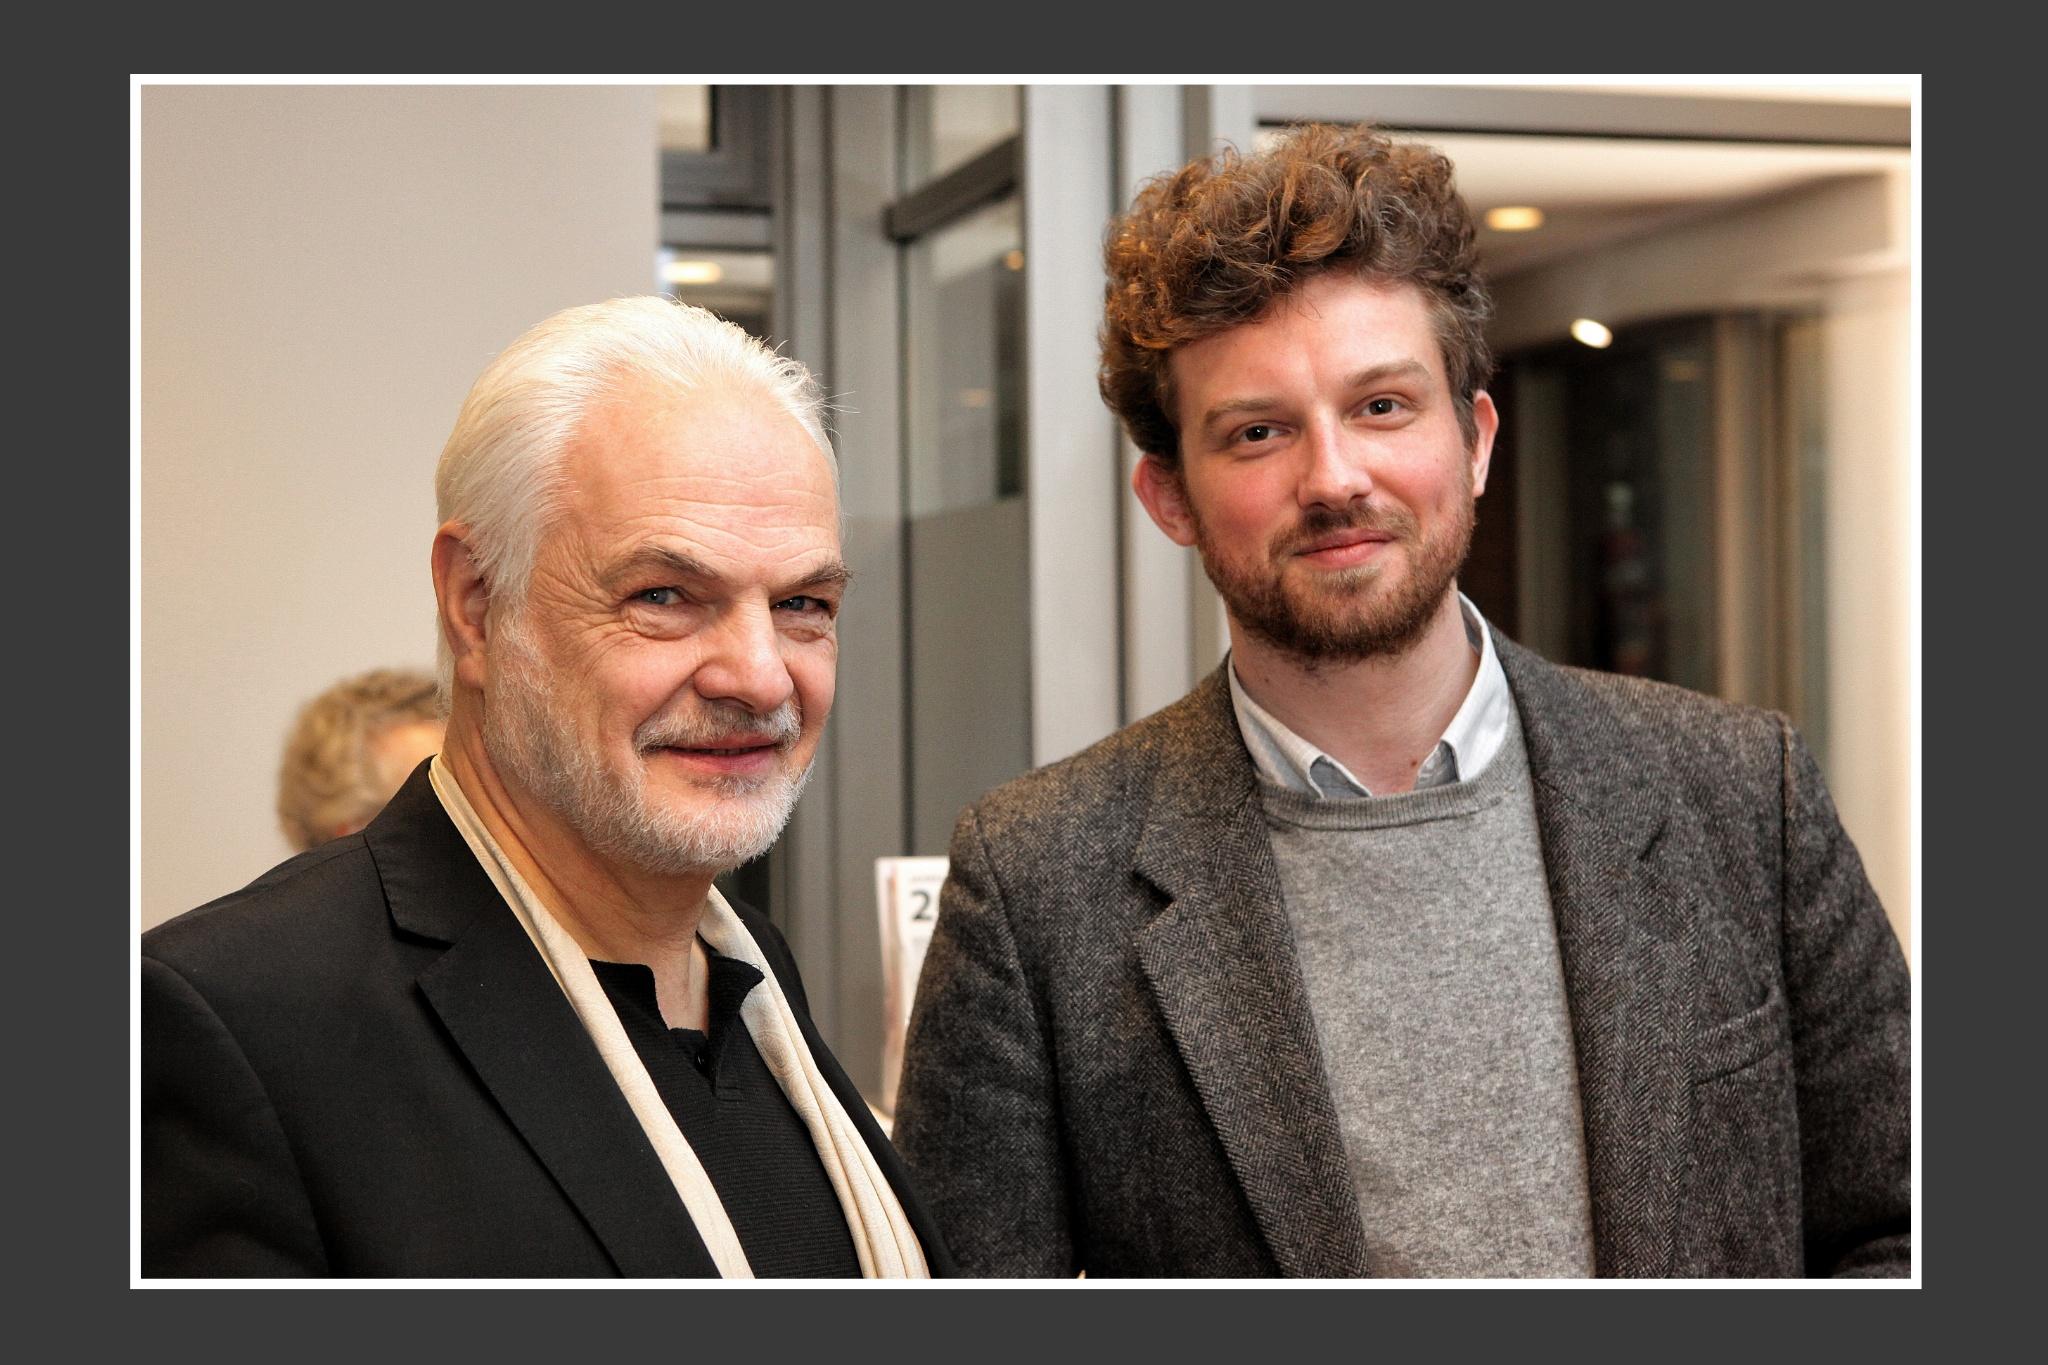 Wittus Witt; Gast im KUNSTVEREIN Buchholz/Nordheide; Tobias Dost